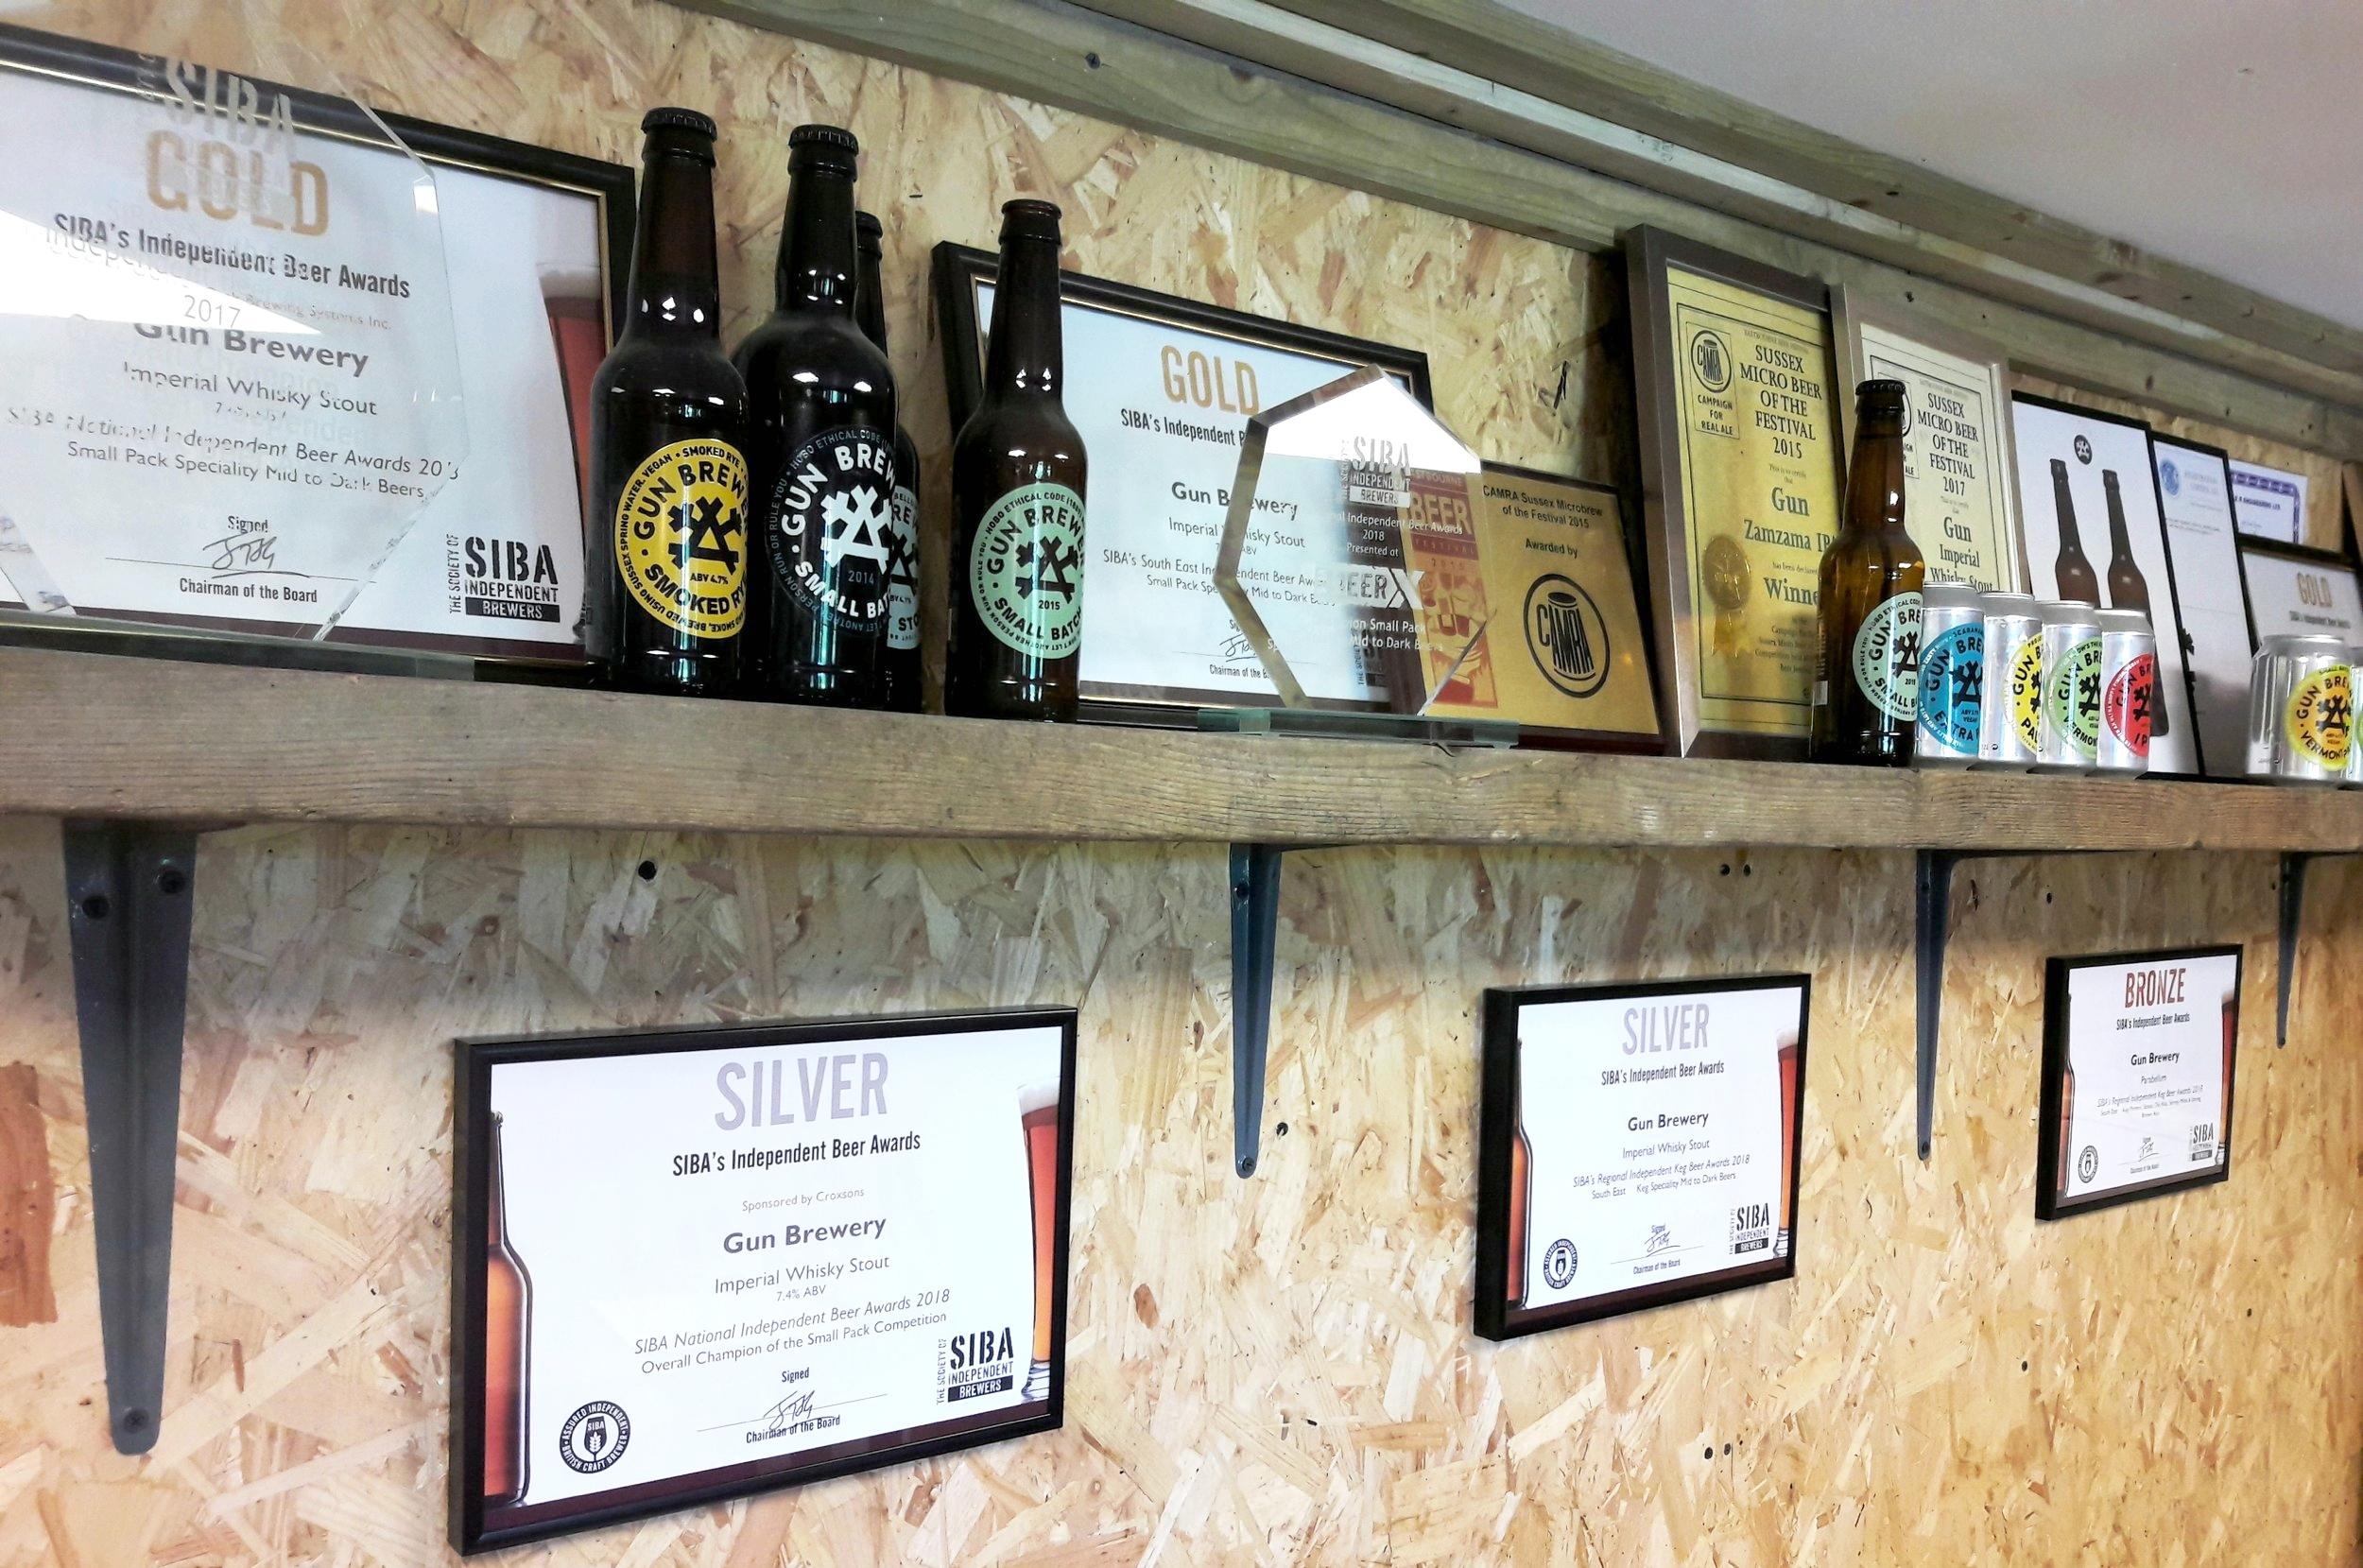 Gun Brewery awards